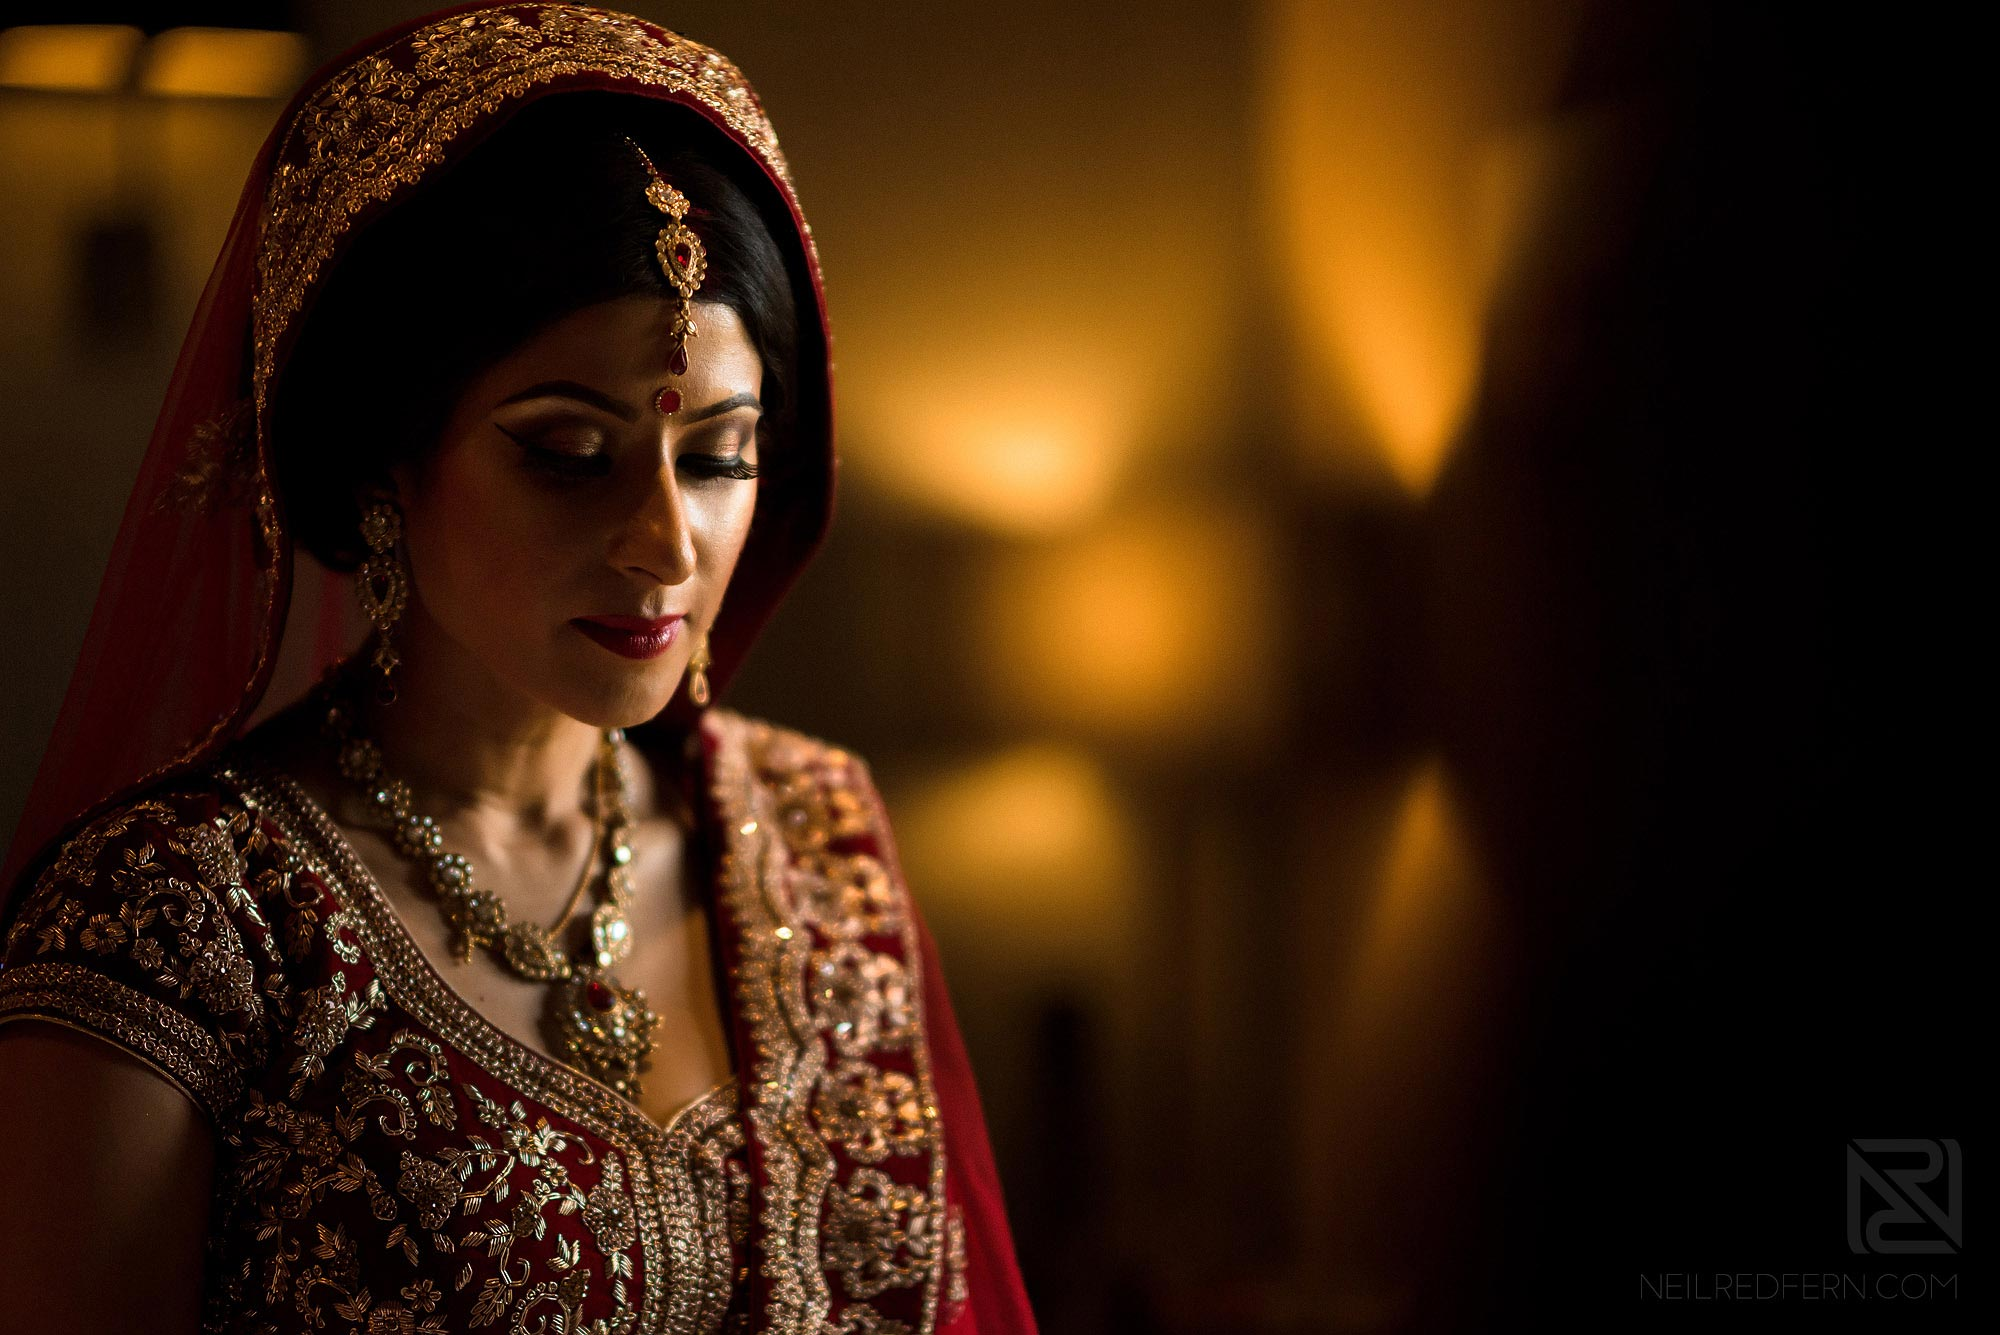 Indian Wedding Photography.Indian Wedding Photography Manchester Award Winning Photographer